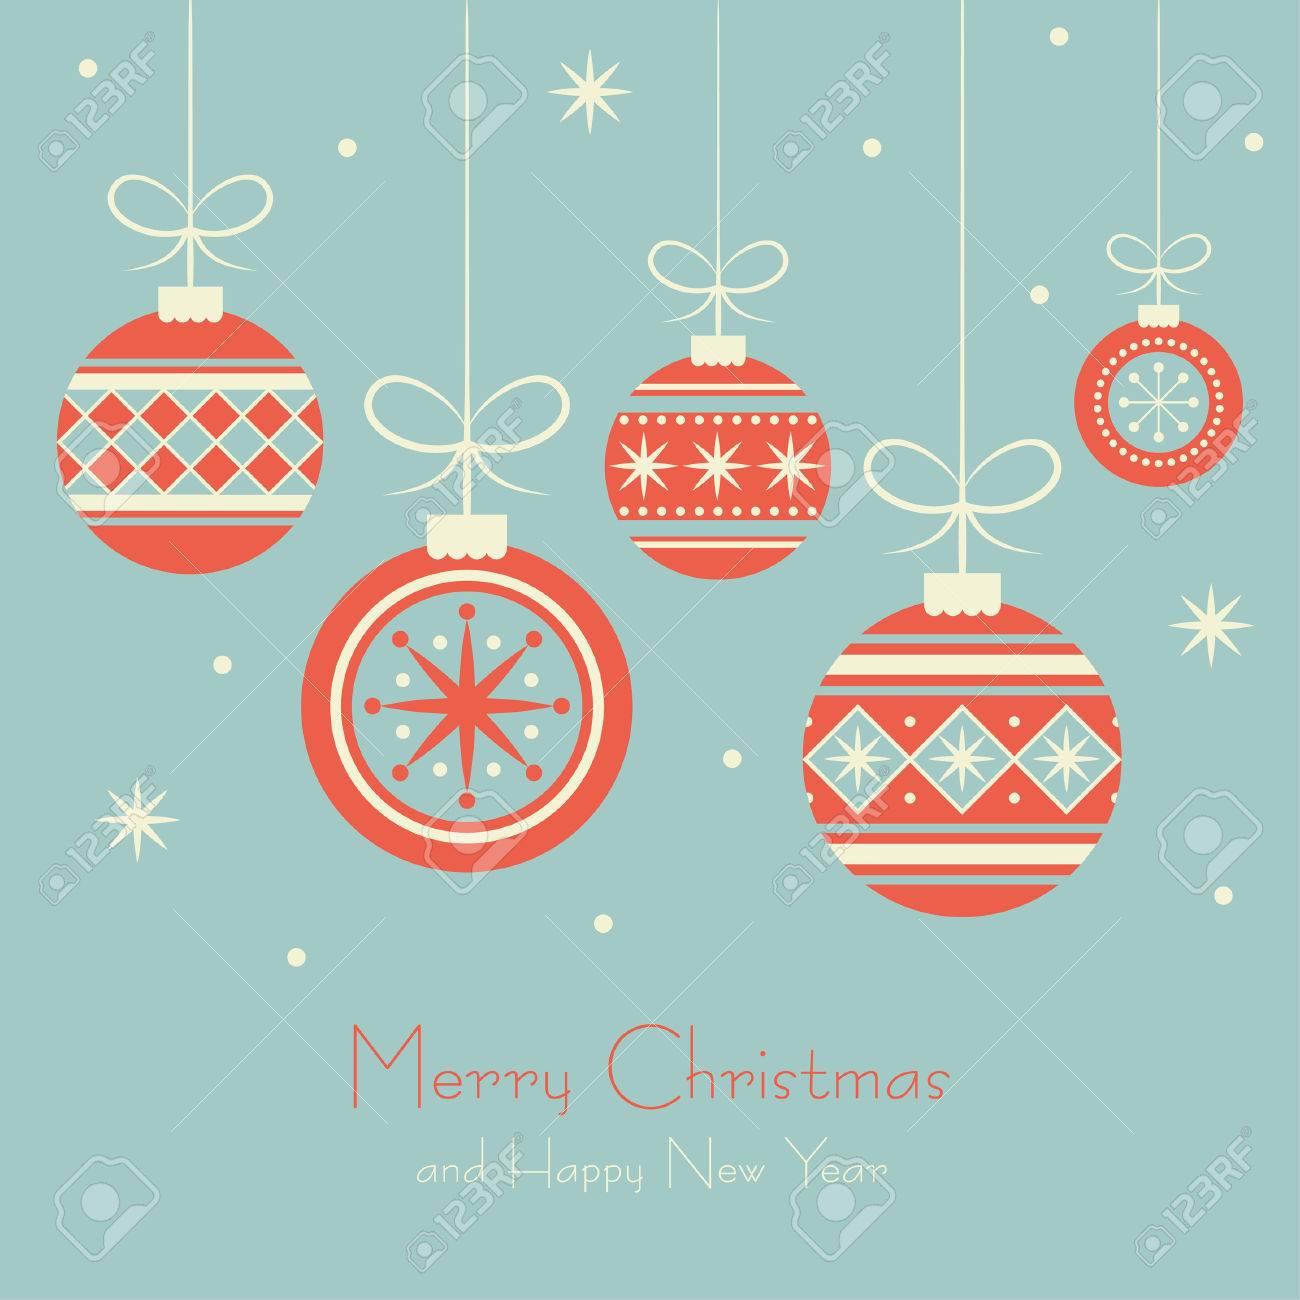 Christmas Card Design.Merry Christmas Card Design Vector Illustration